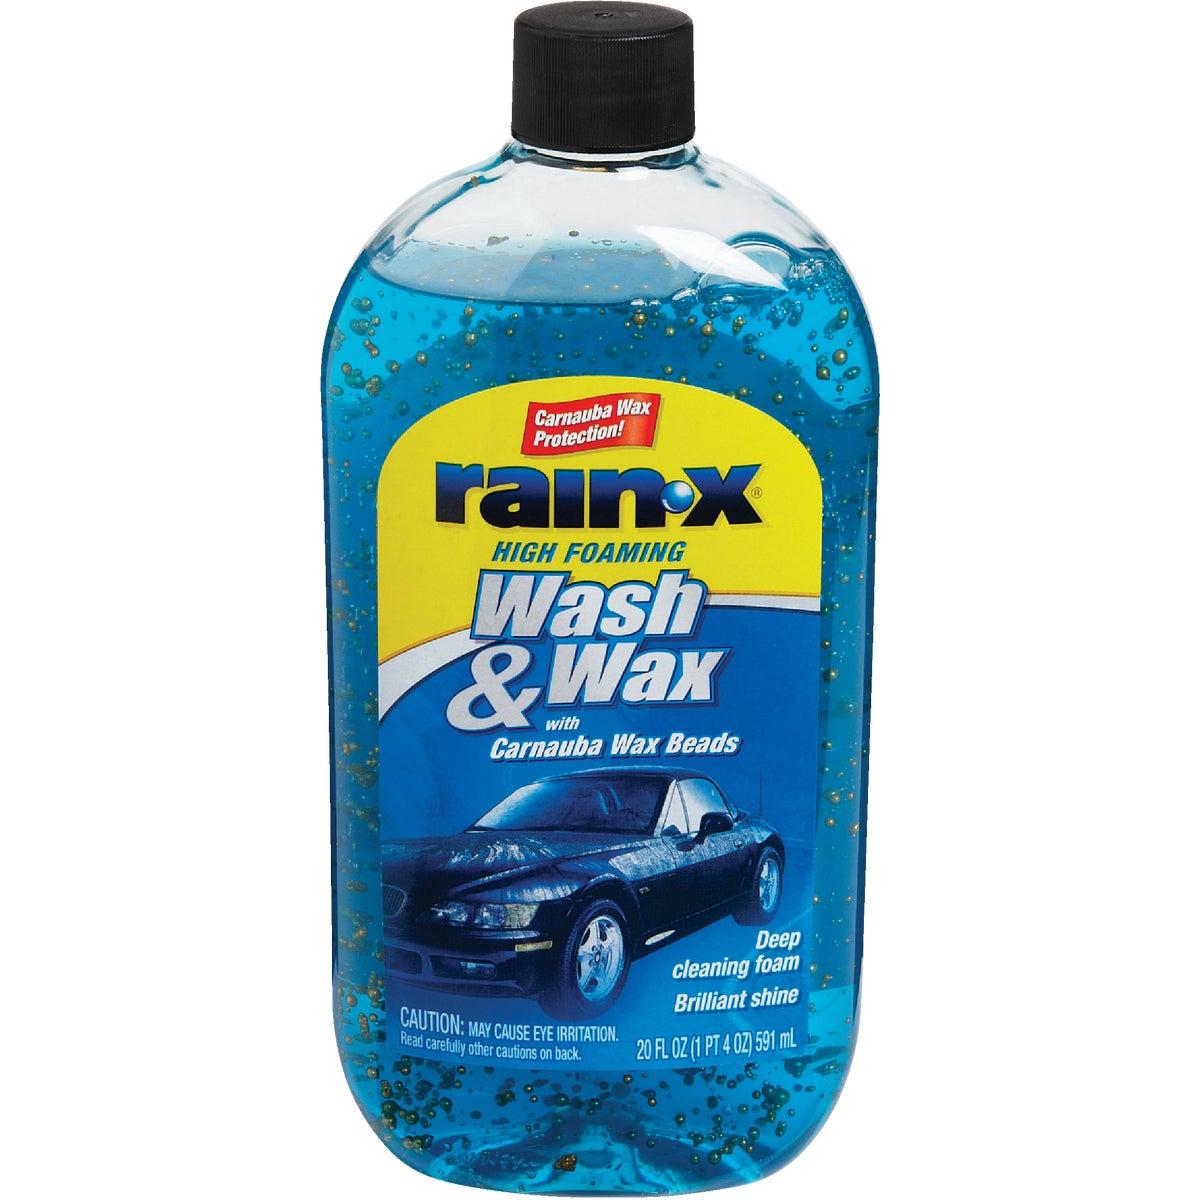 20OZ WASH & WAX CAR WASH - RX51820D by Itw Global Brands